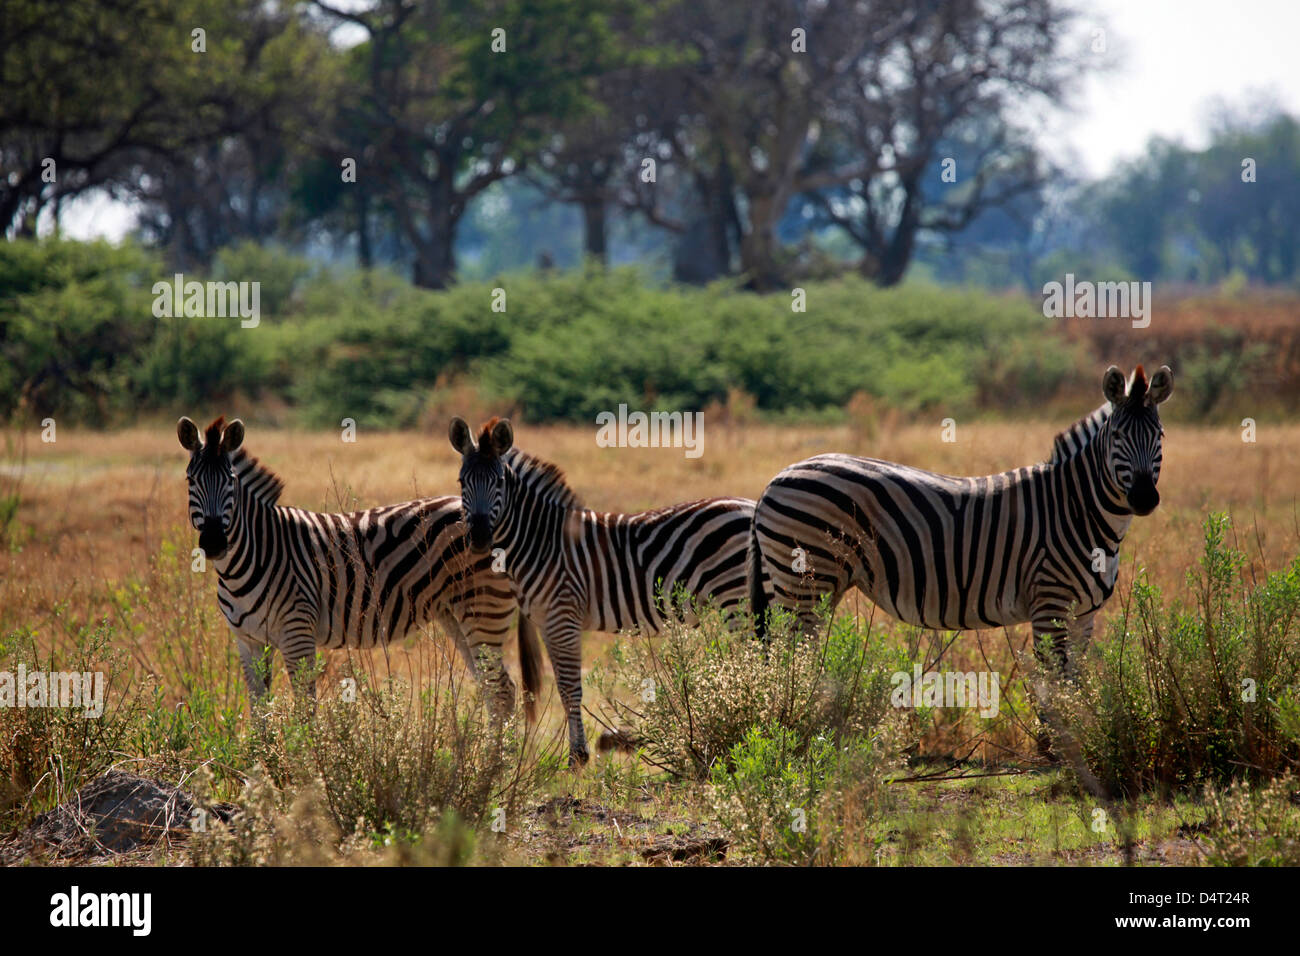 Botswana, Okavango Delta. Burchell's Zebra. - Stock Image